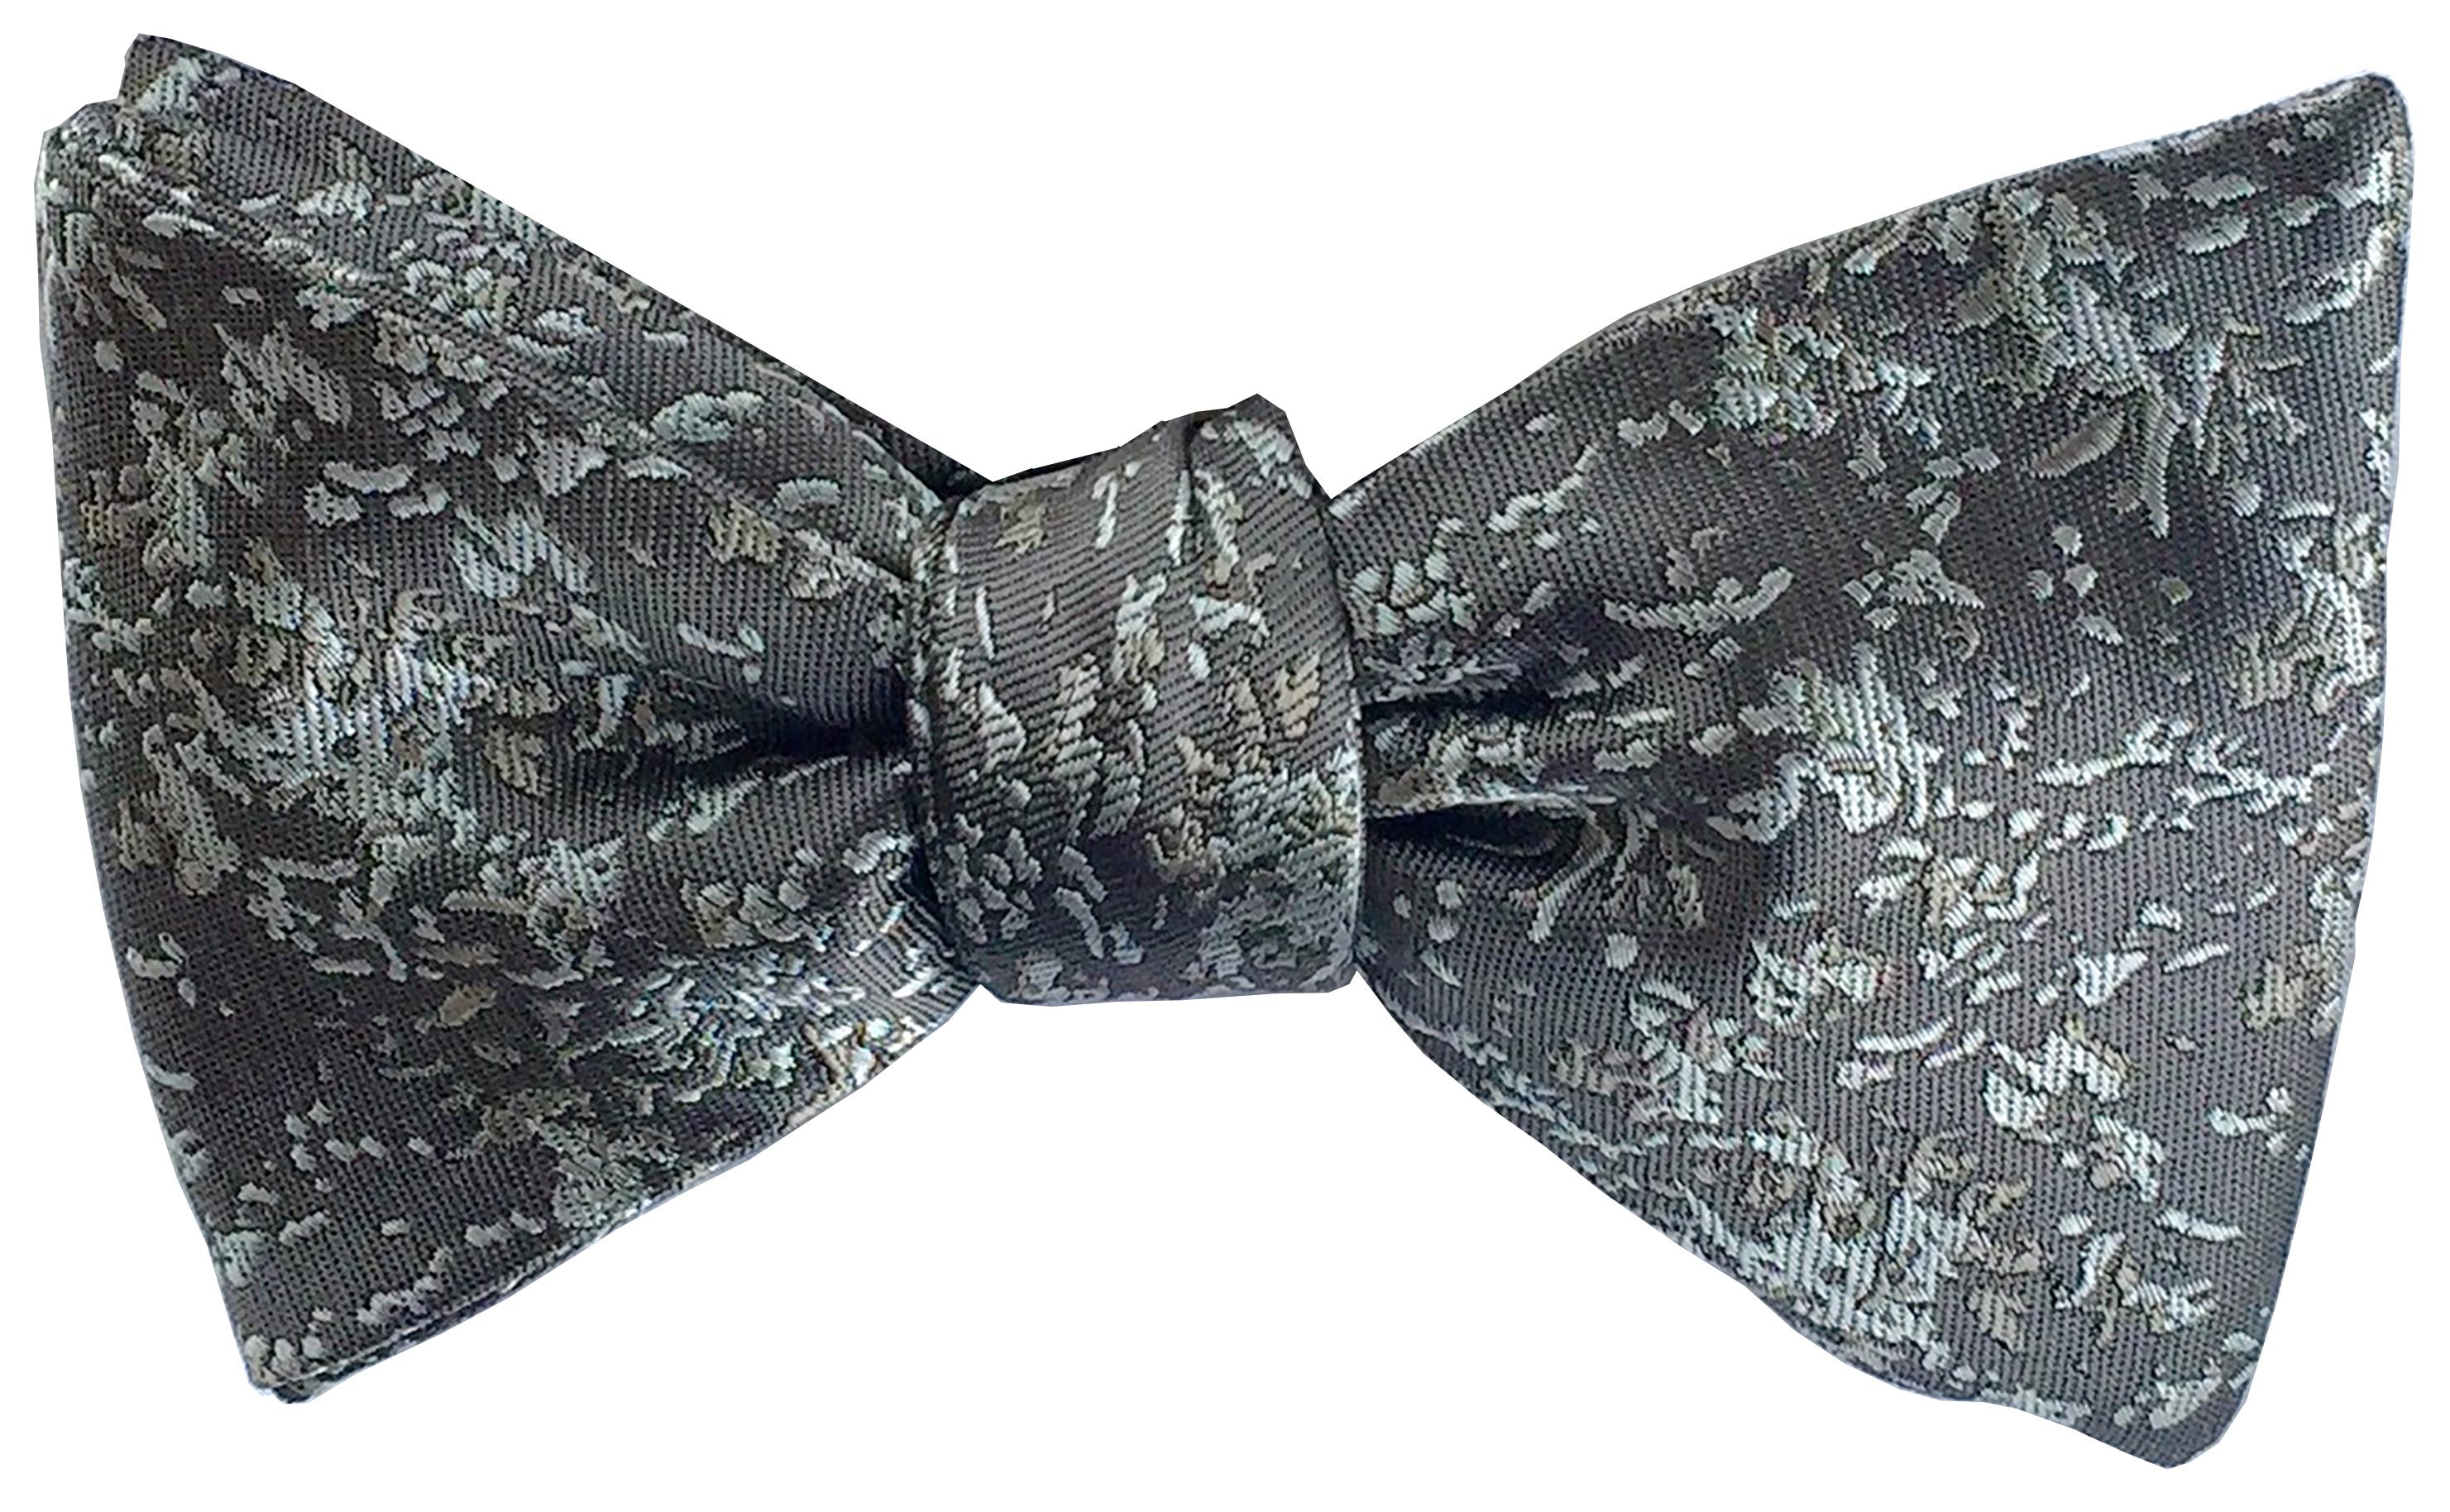 Arctic Drift bow tie in grey